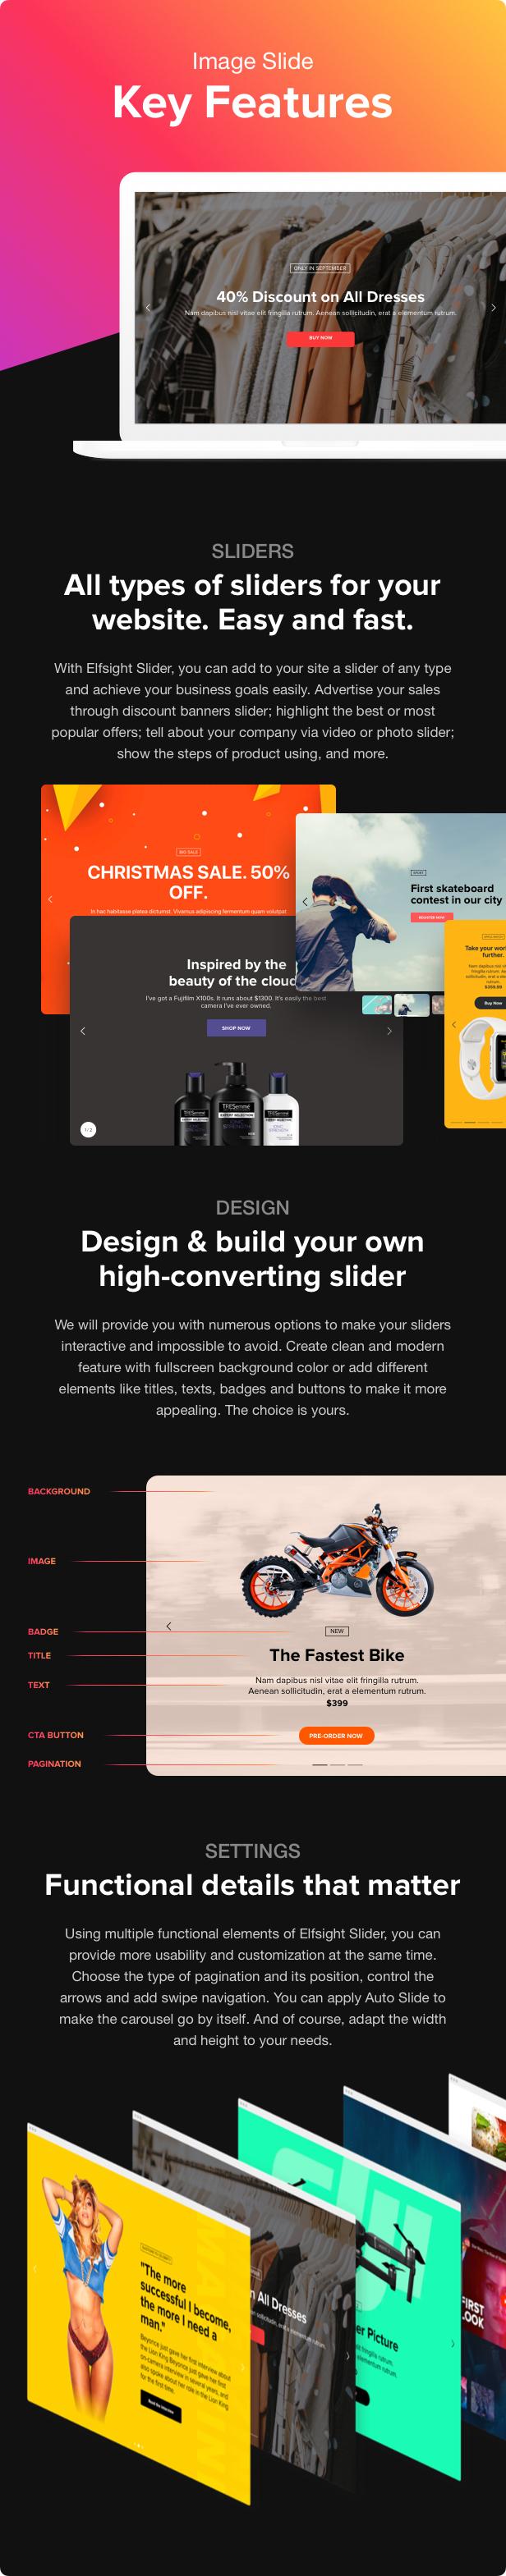 Slider - WordPress Image Slider Plugin - 2